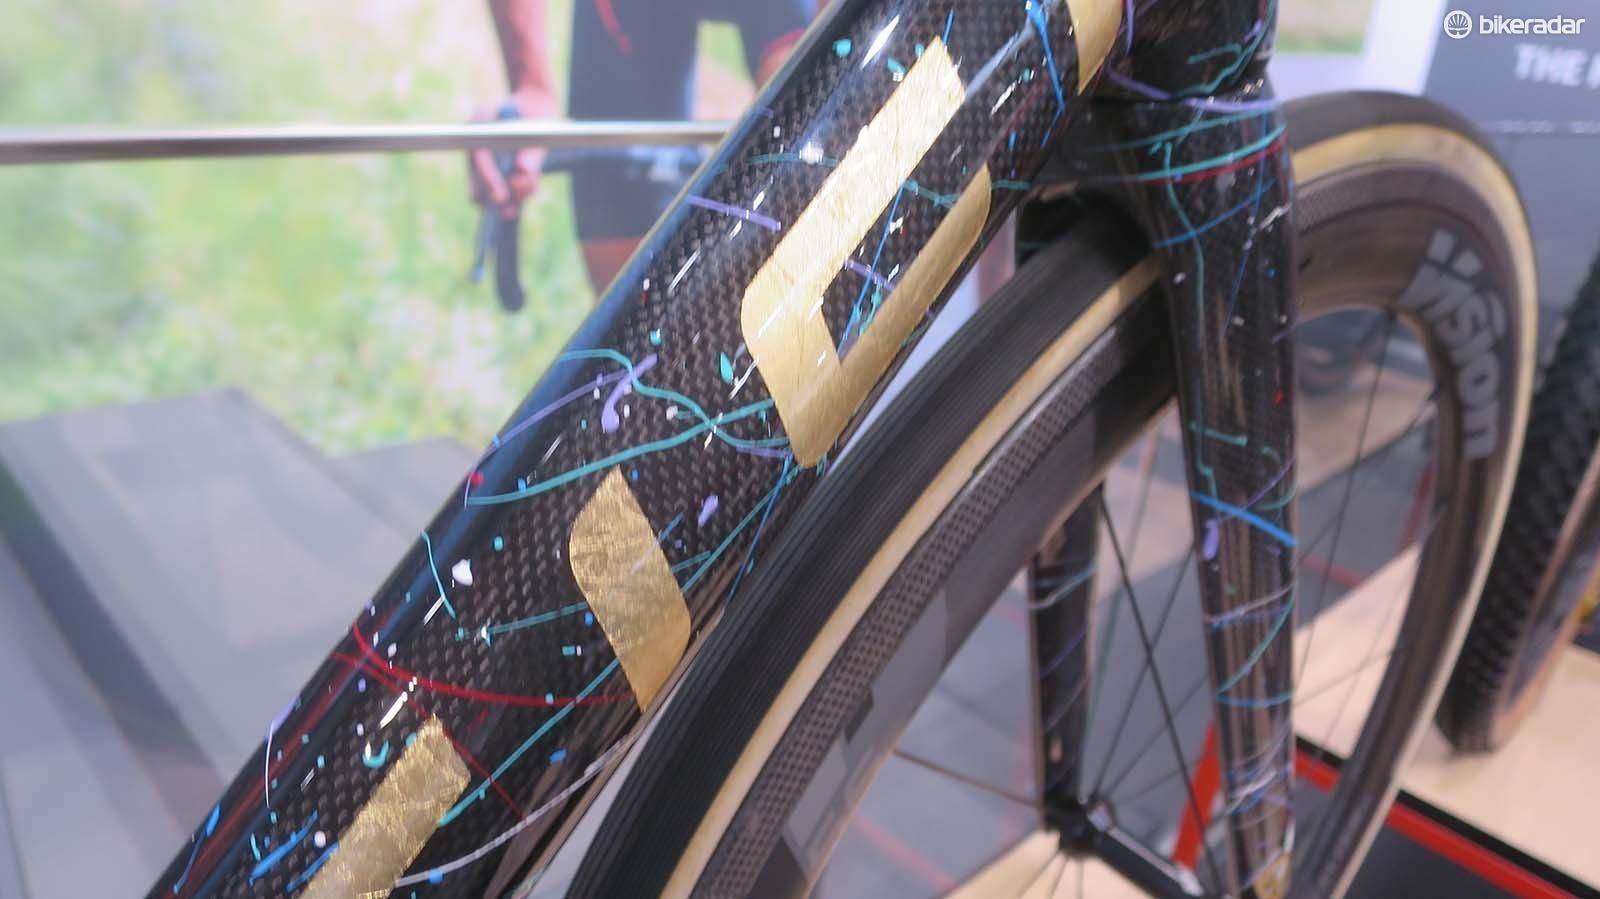 The splatter finishing reminds us of the best of Dario Pegoretti's bikes